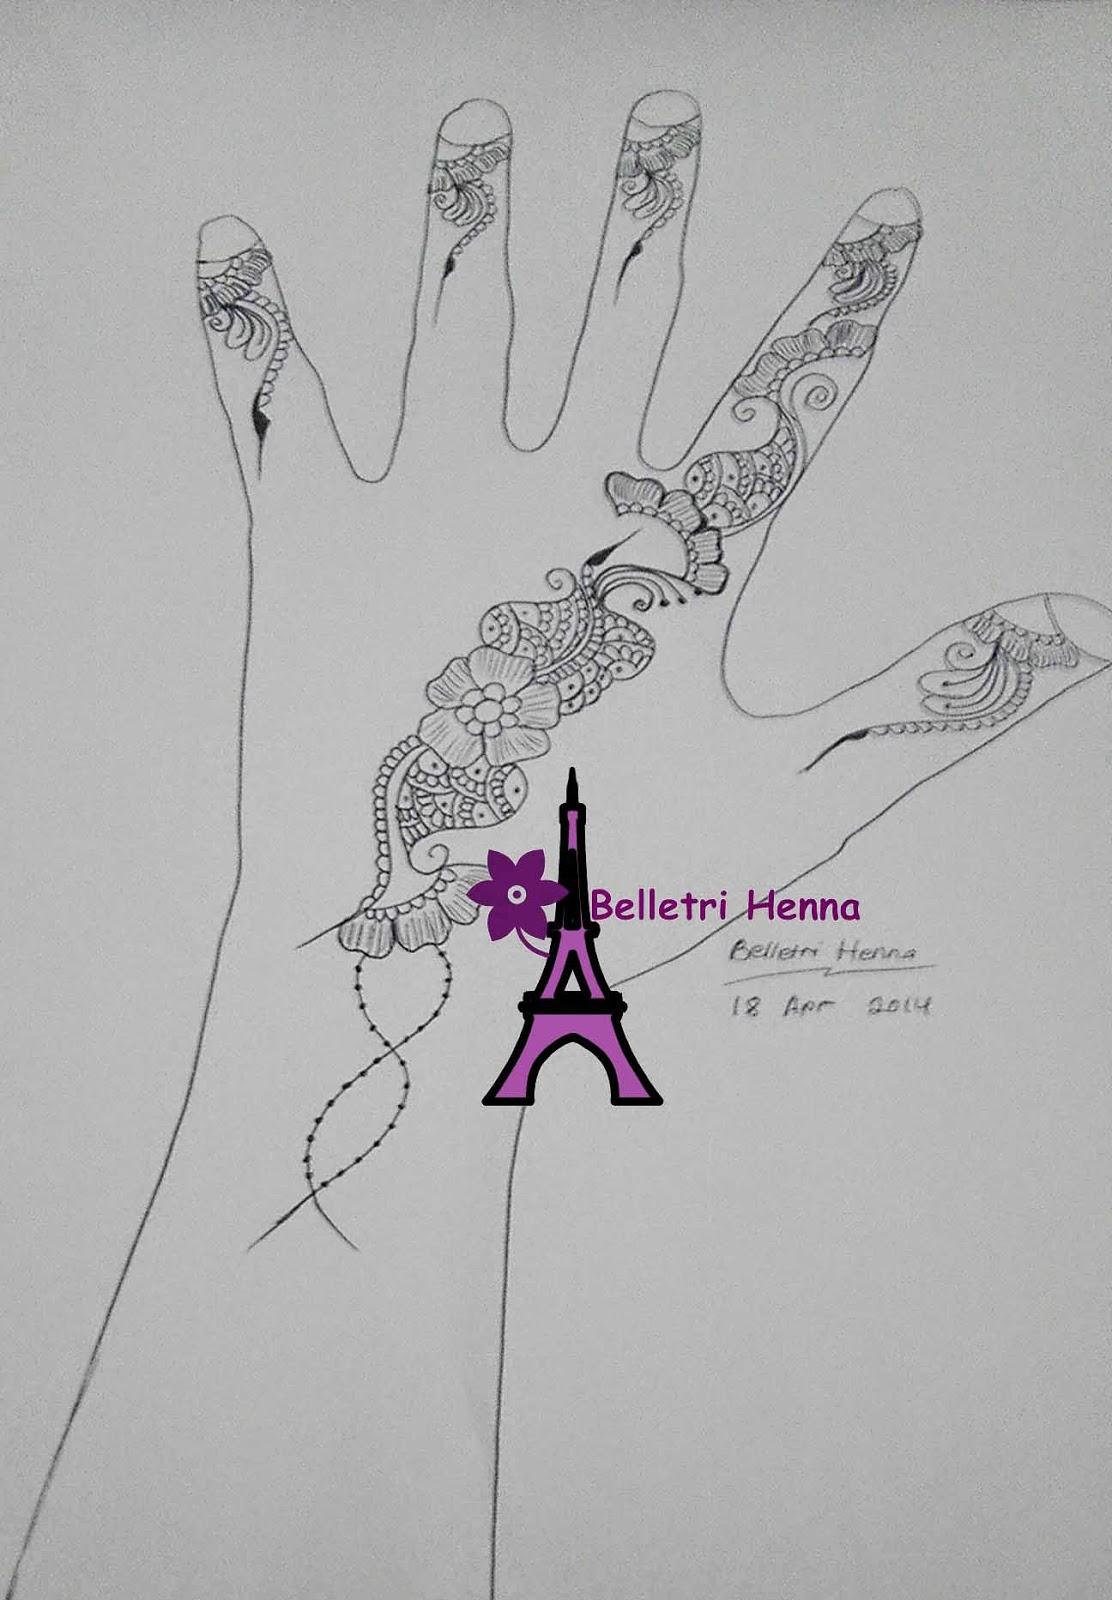 BELLETRI HENNA BELAJAR MELUKIS HENNA BY BELLETRI HENNA